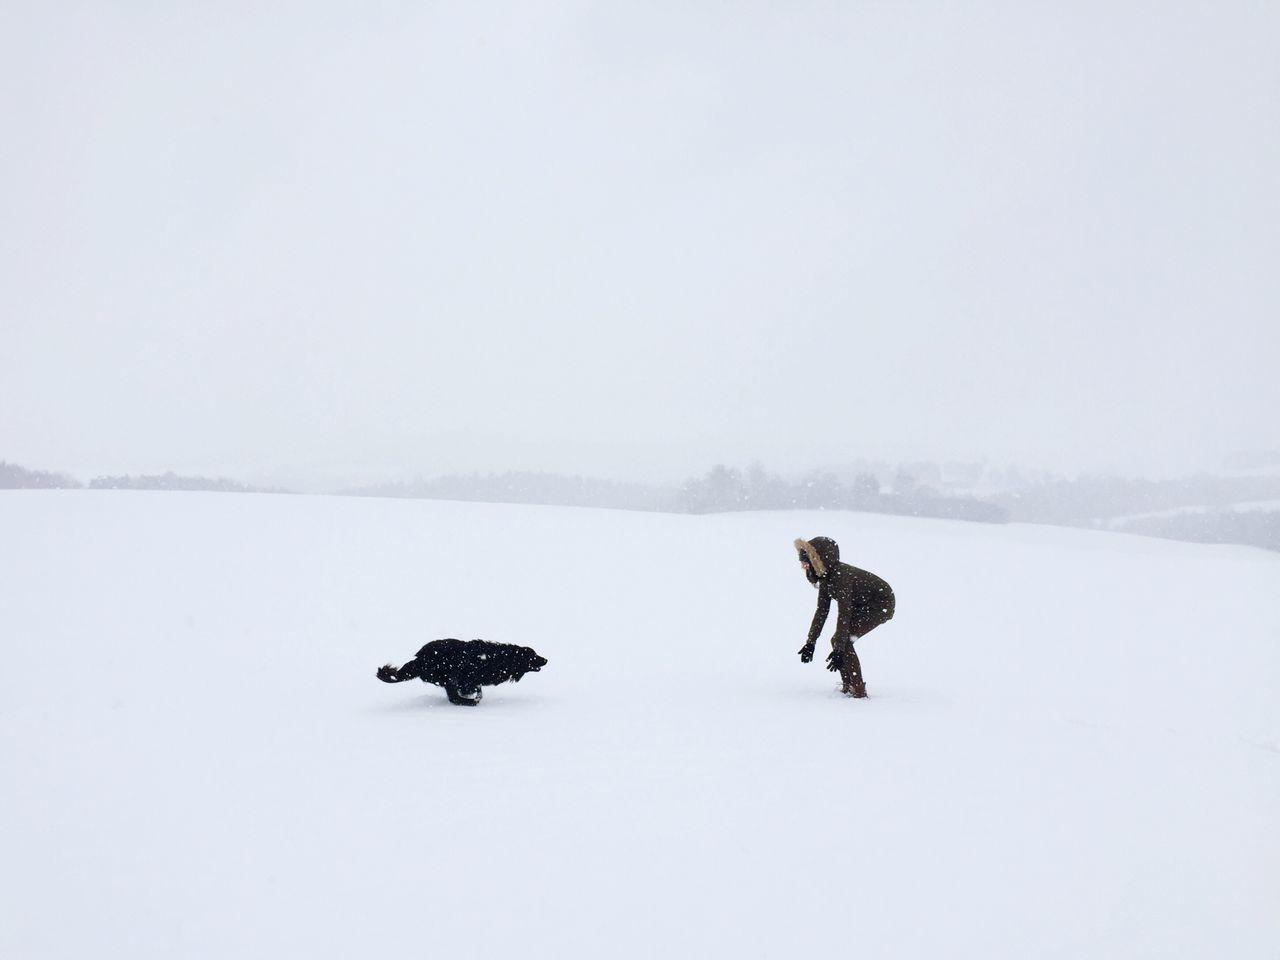 Beautiful stock photos of liebe, winter, cold temperature, snow, season